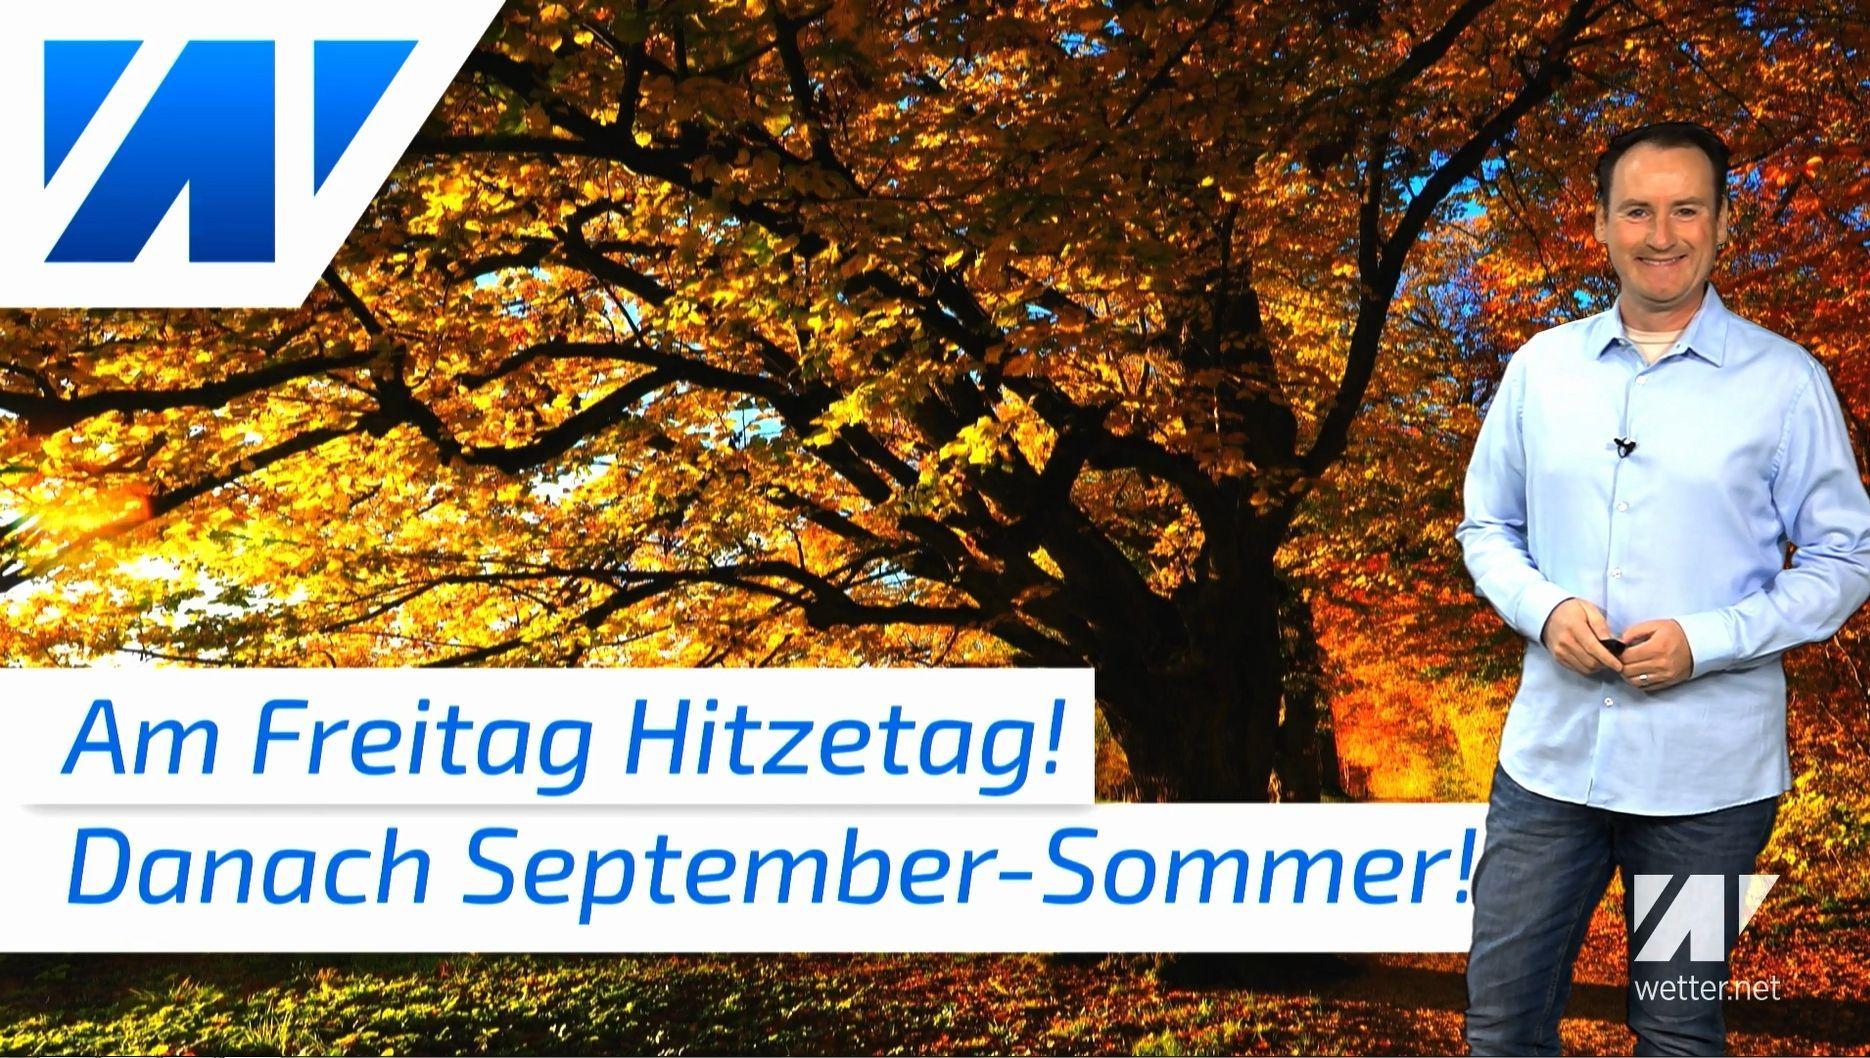 Erst Hitzetag, dann September-Sommer? So geht´s beim Wetter weiter!